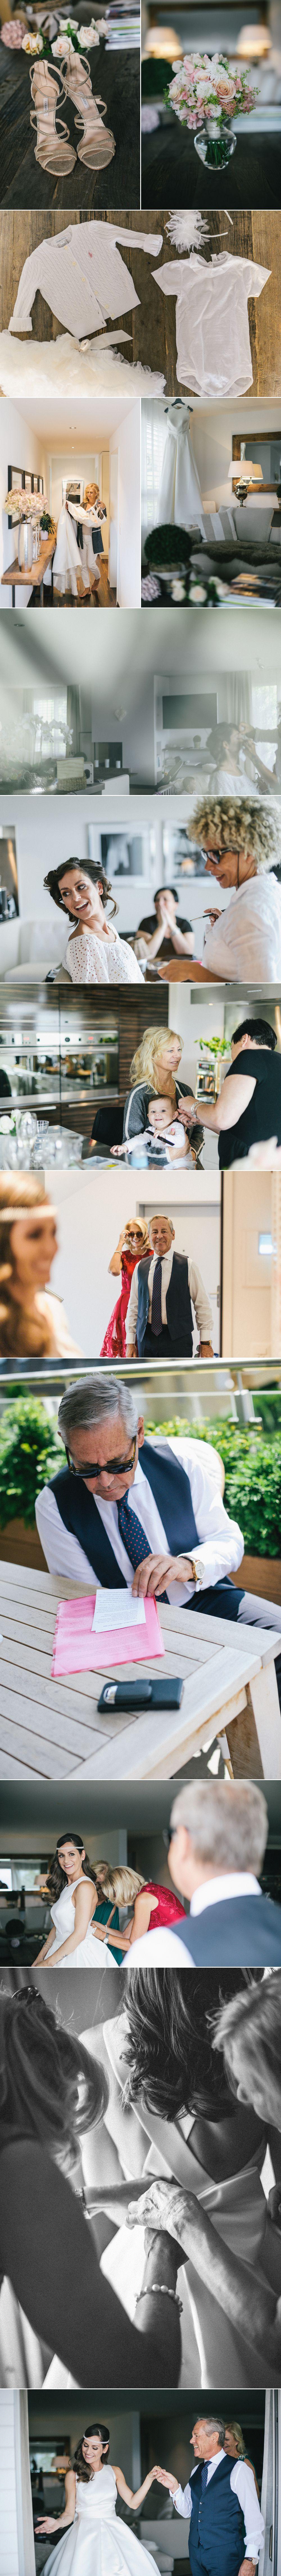 Wedding photos at Fishstube